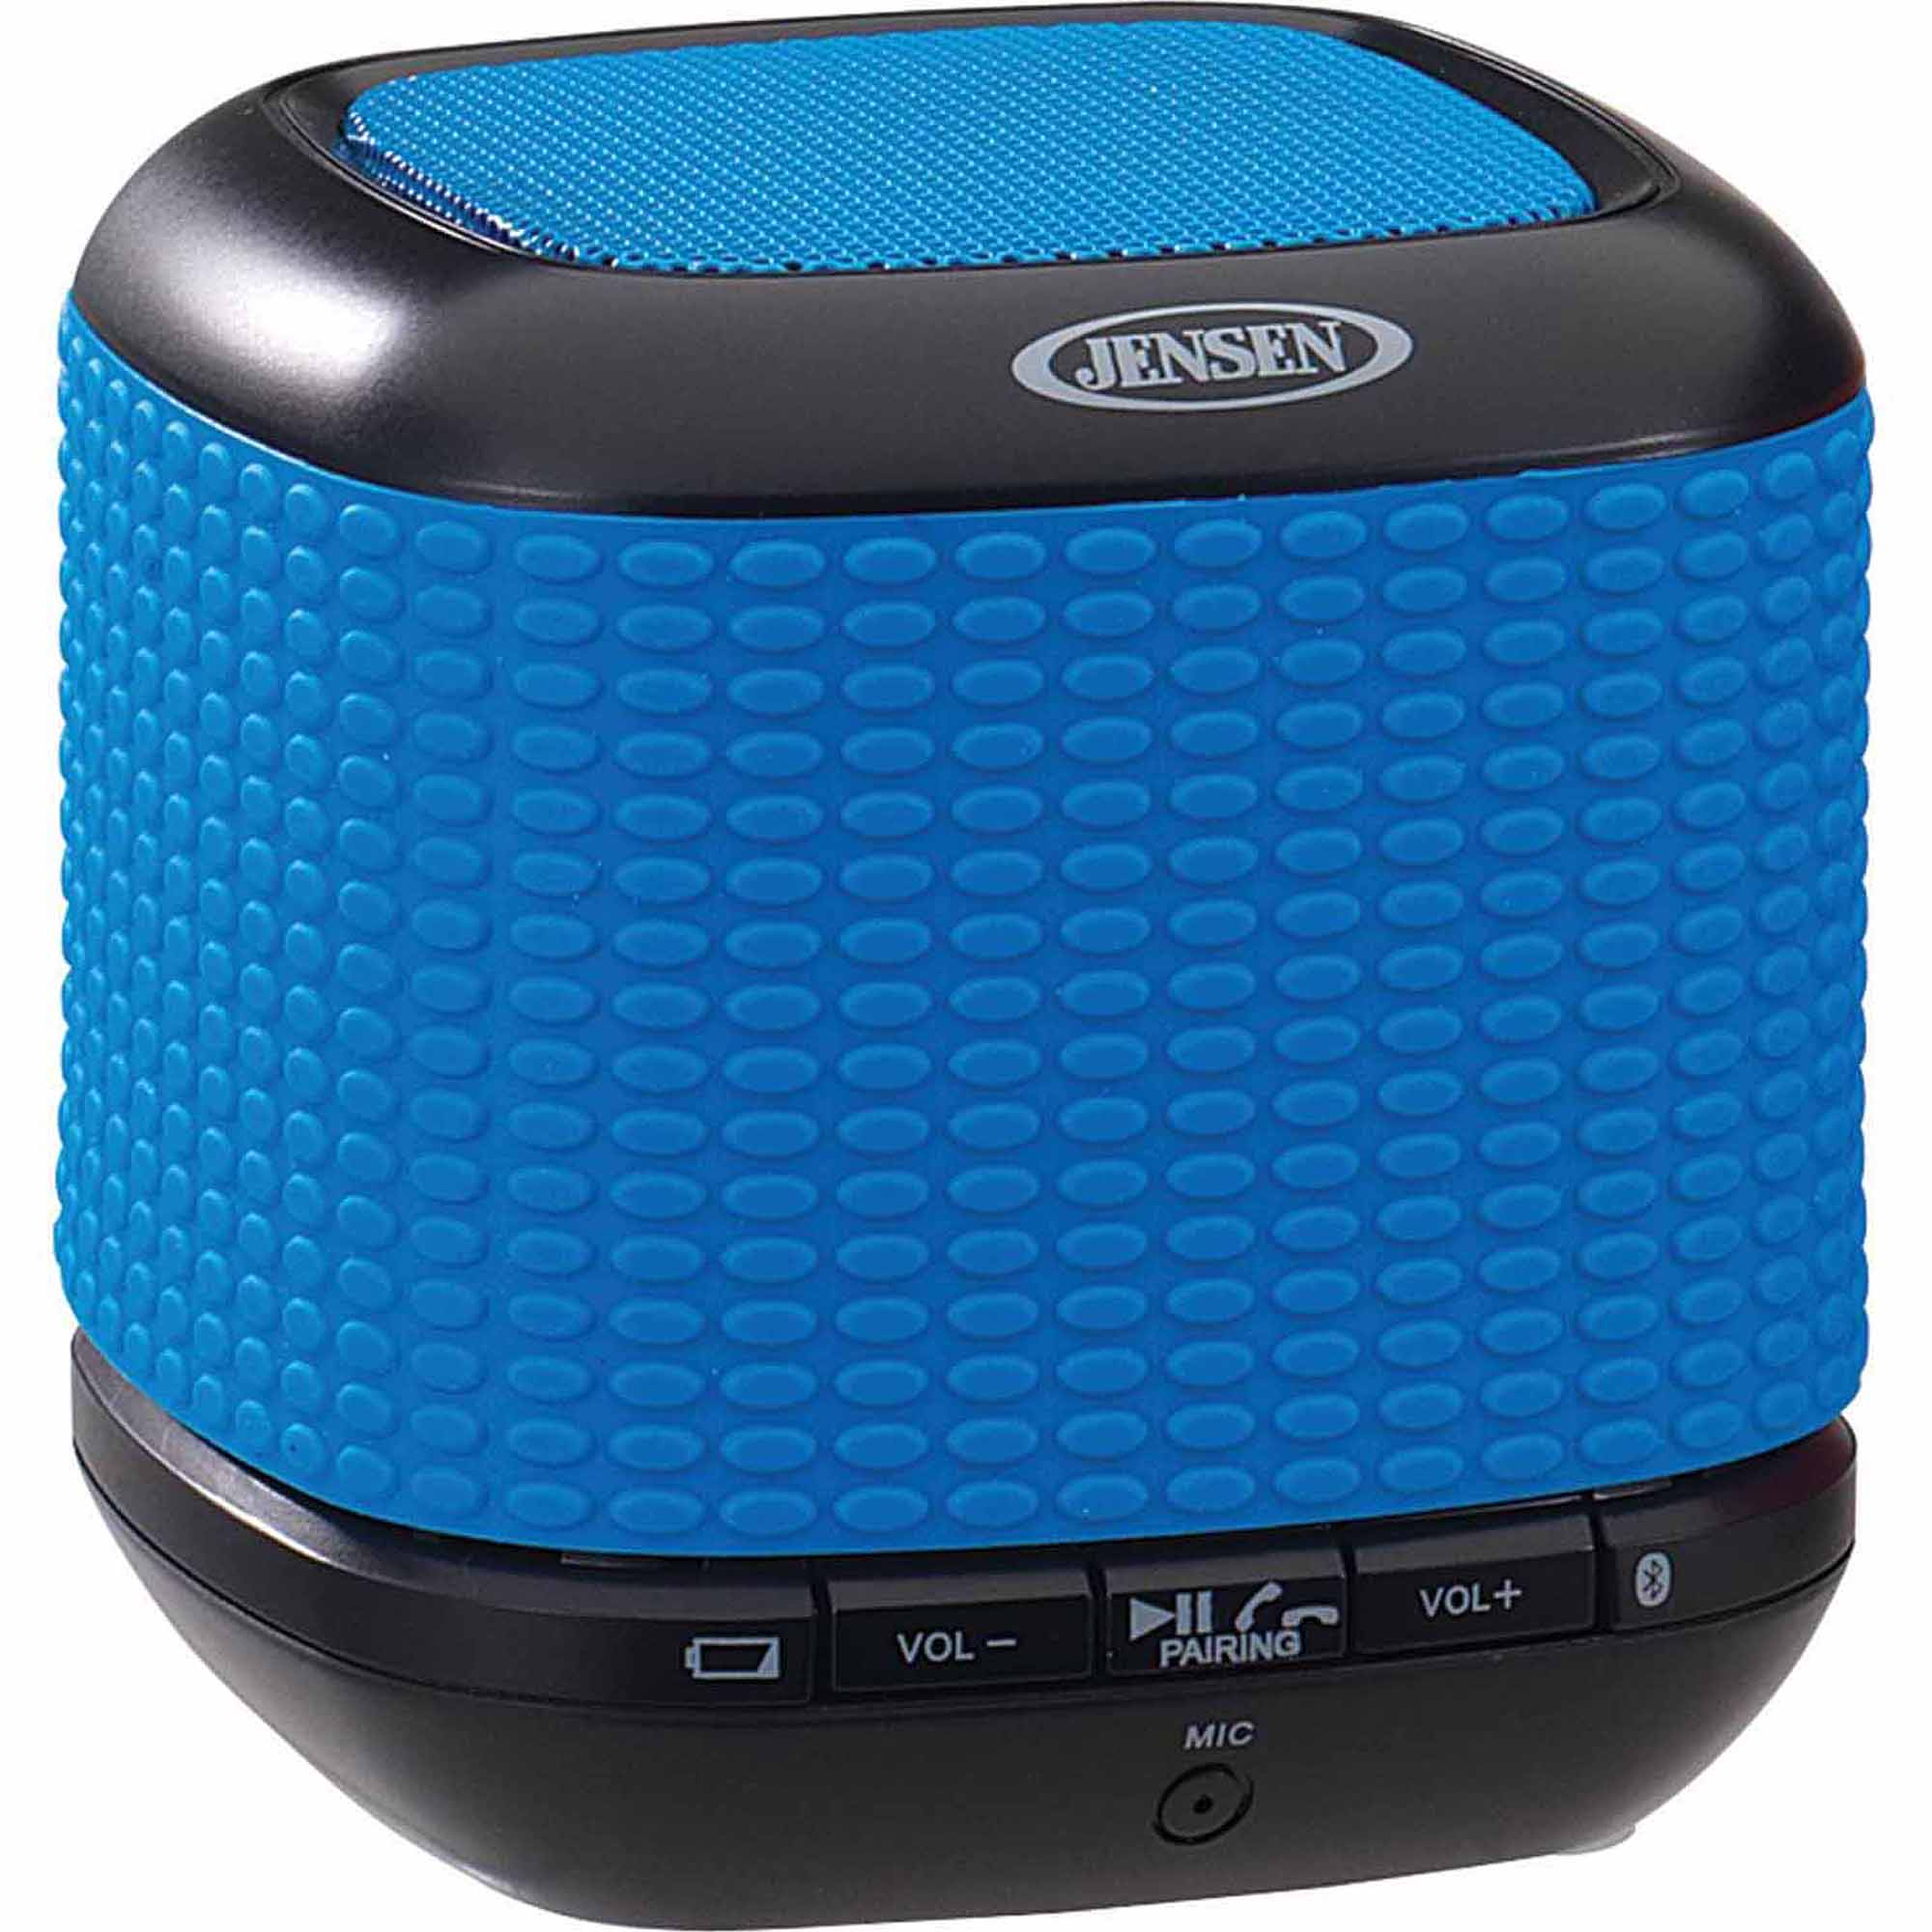 JENSEN SMPS-621-BL Portable Bluetooth(R) Speaker (Blue)